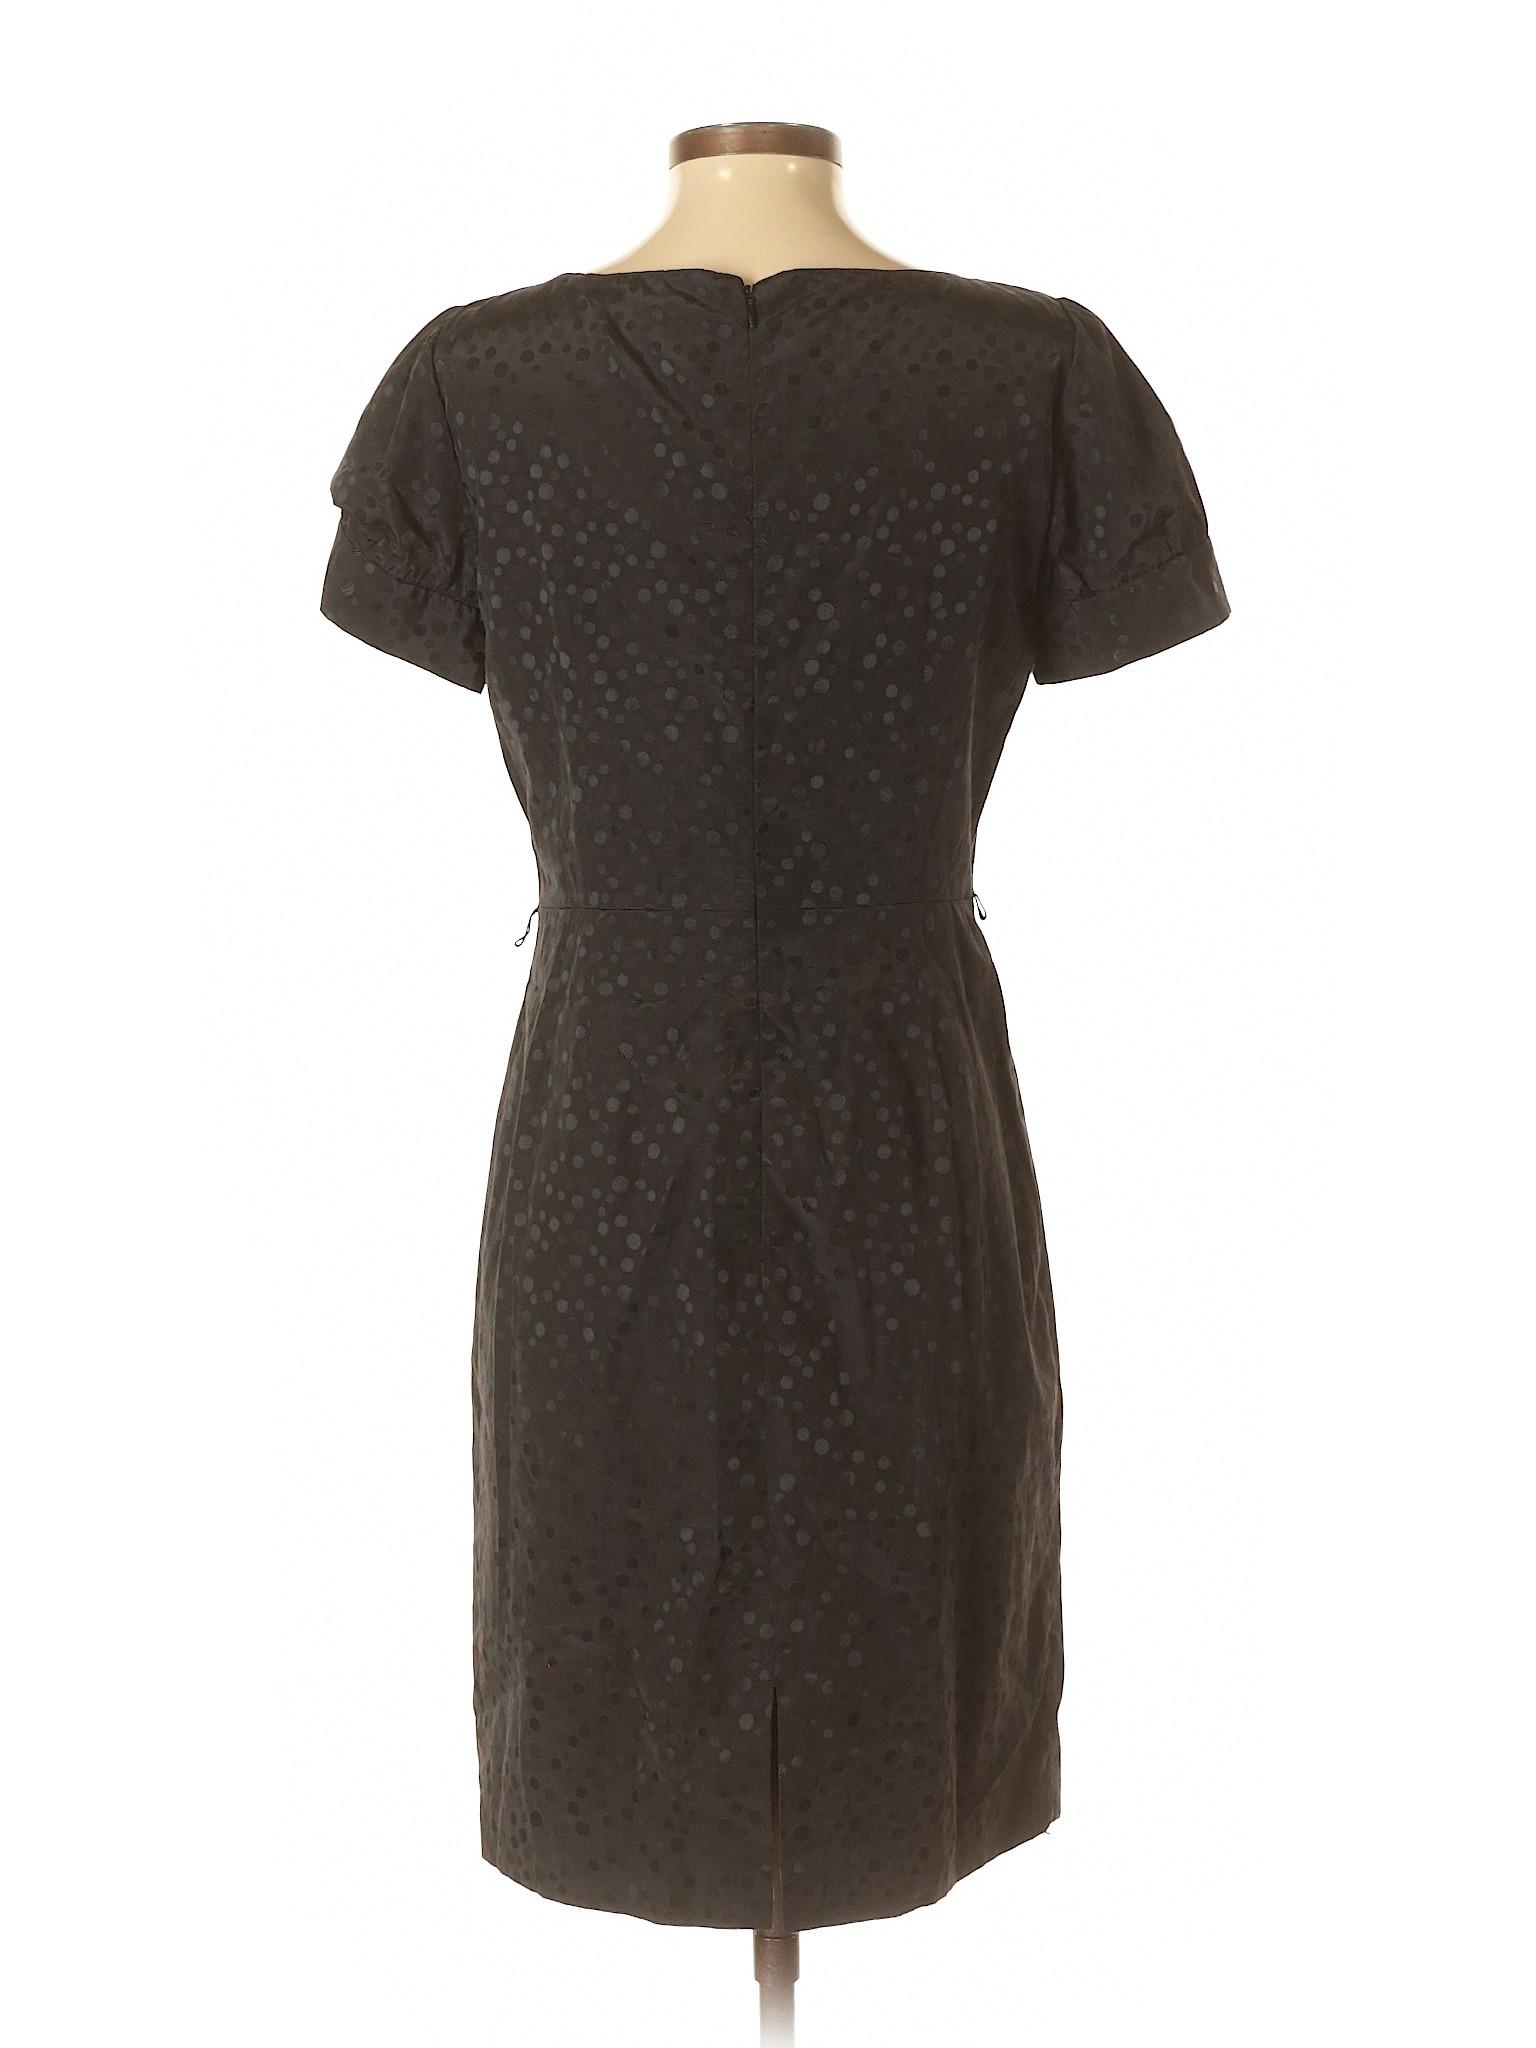 Dress winter Melani Casual Boutique Antonio nwYqxd6IA